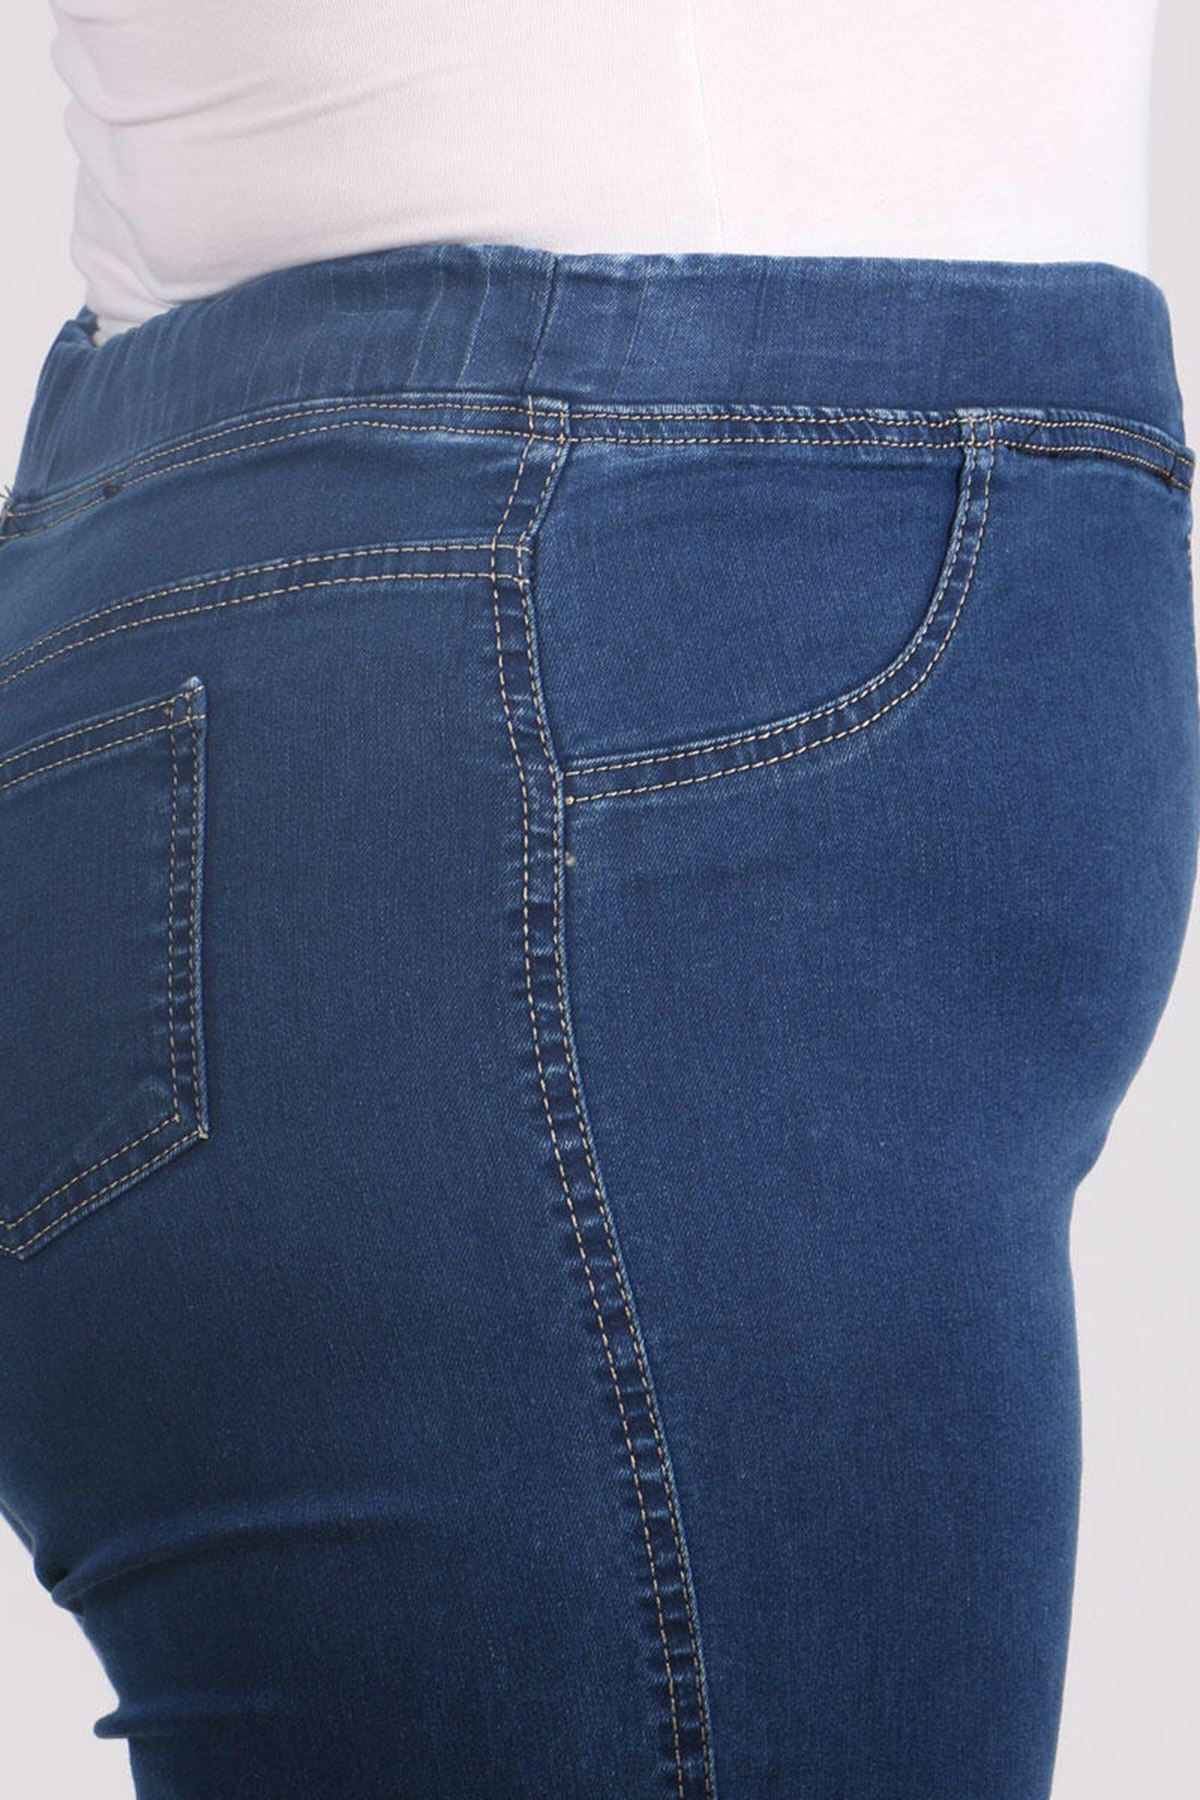 9109-7 Büyük Beden Beli Lastikli Dar Paça Kot Pantalon-Lacivert